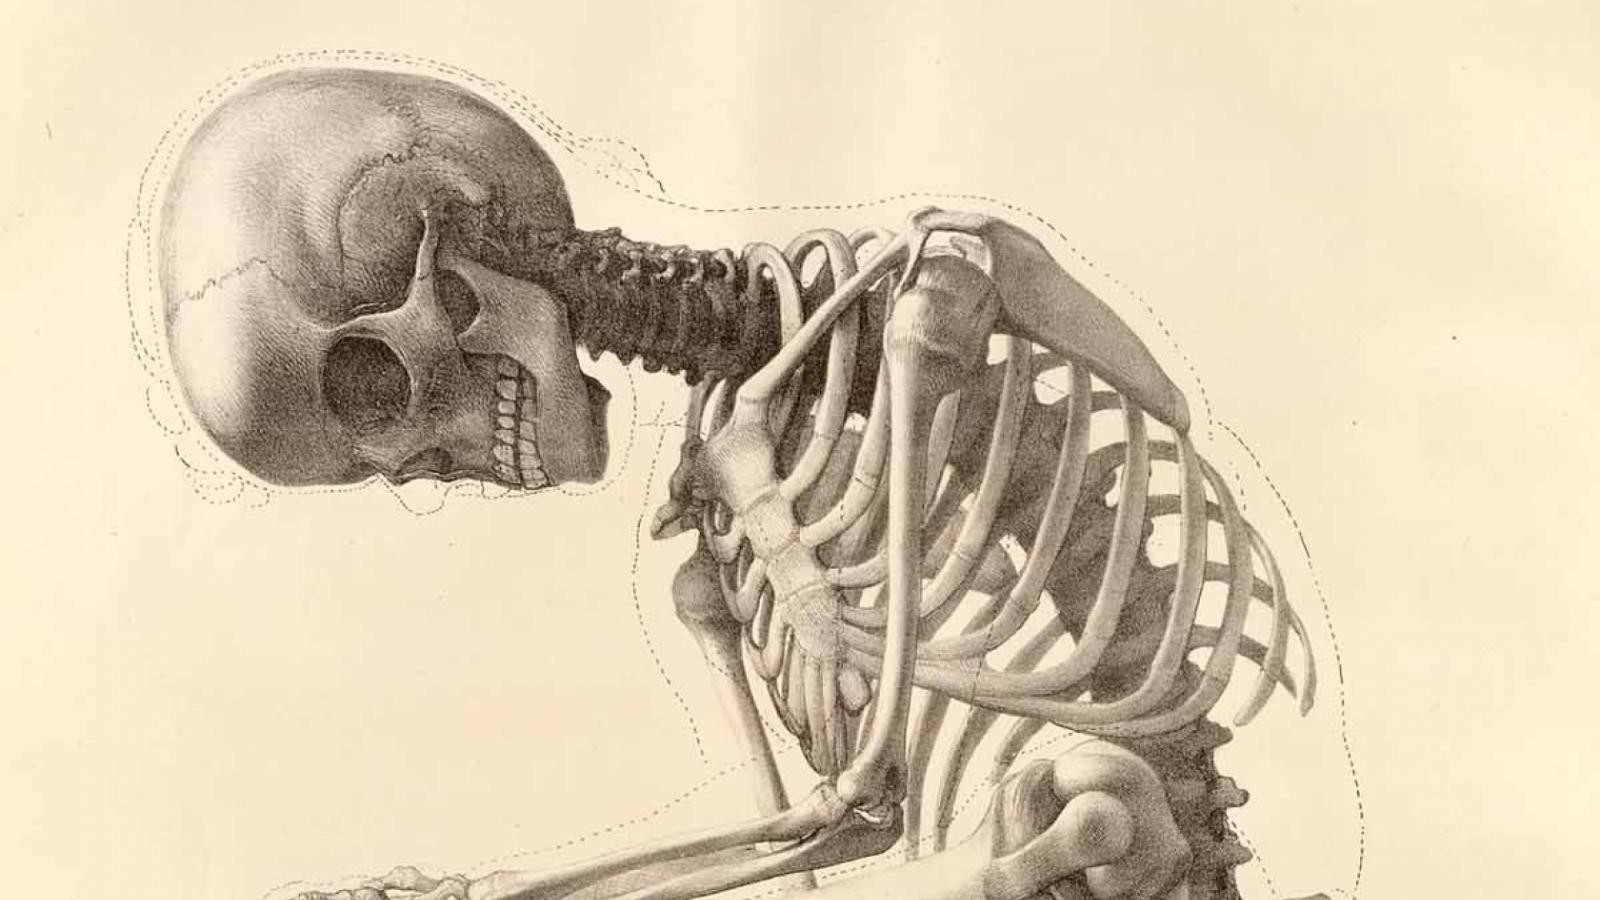 Free Download Skeleton Human Body Art Anatomy Bones 1200x1642 Wallpaper Wallpaper 1680x1050 For Your Desktop Mobile Tablet Explore 47 Human Anatomy Wallpaper Heart Wallpapers For Desktop Human Body Wallpaper